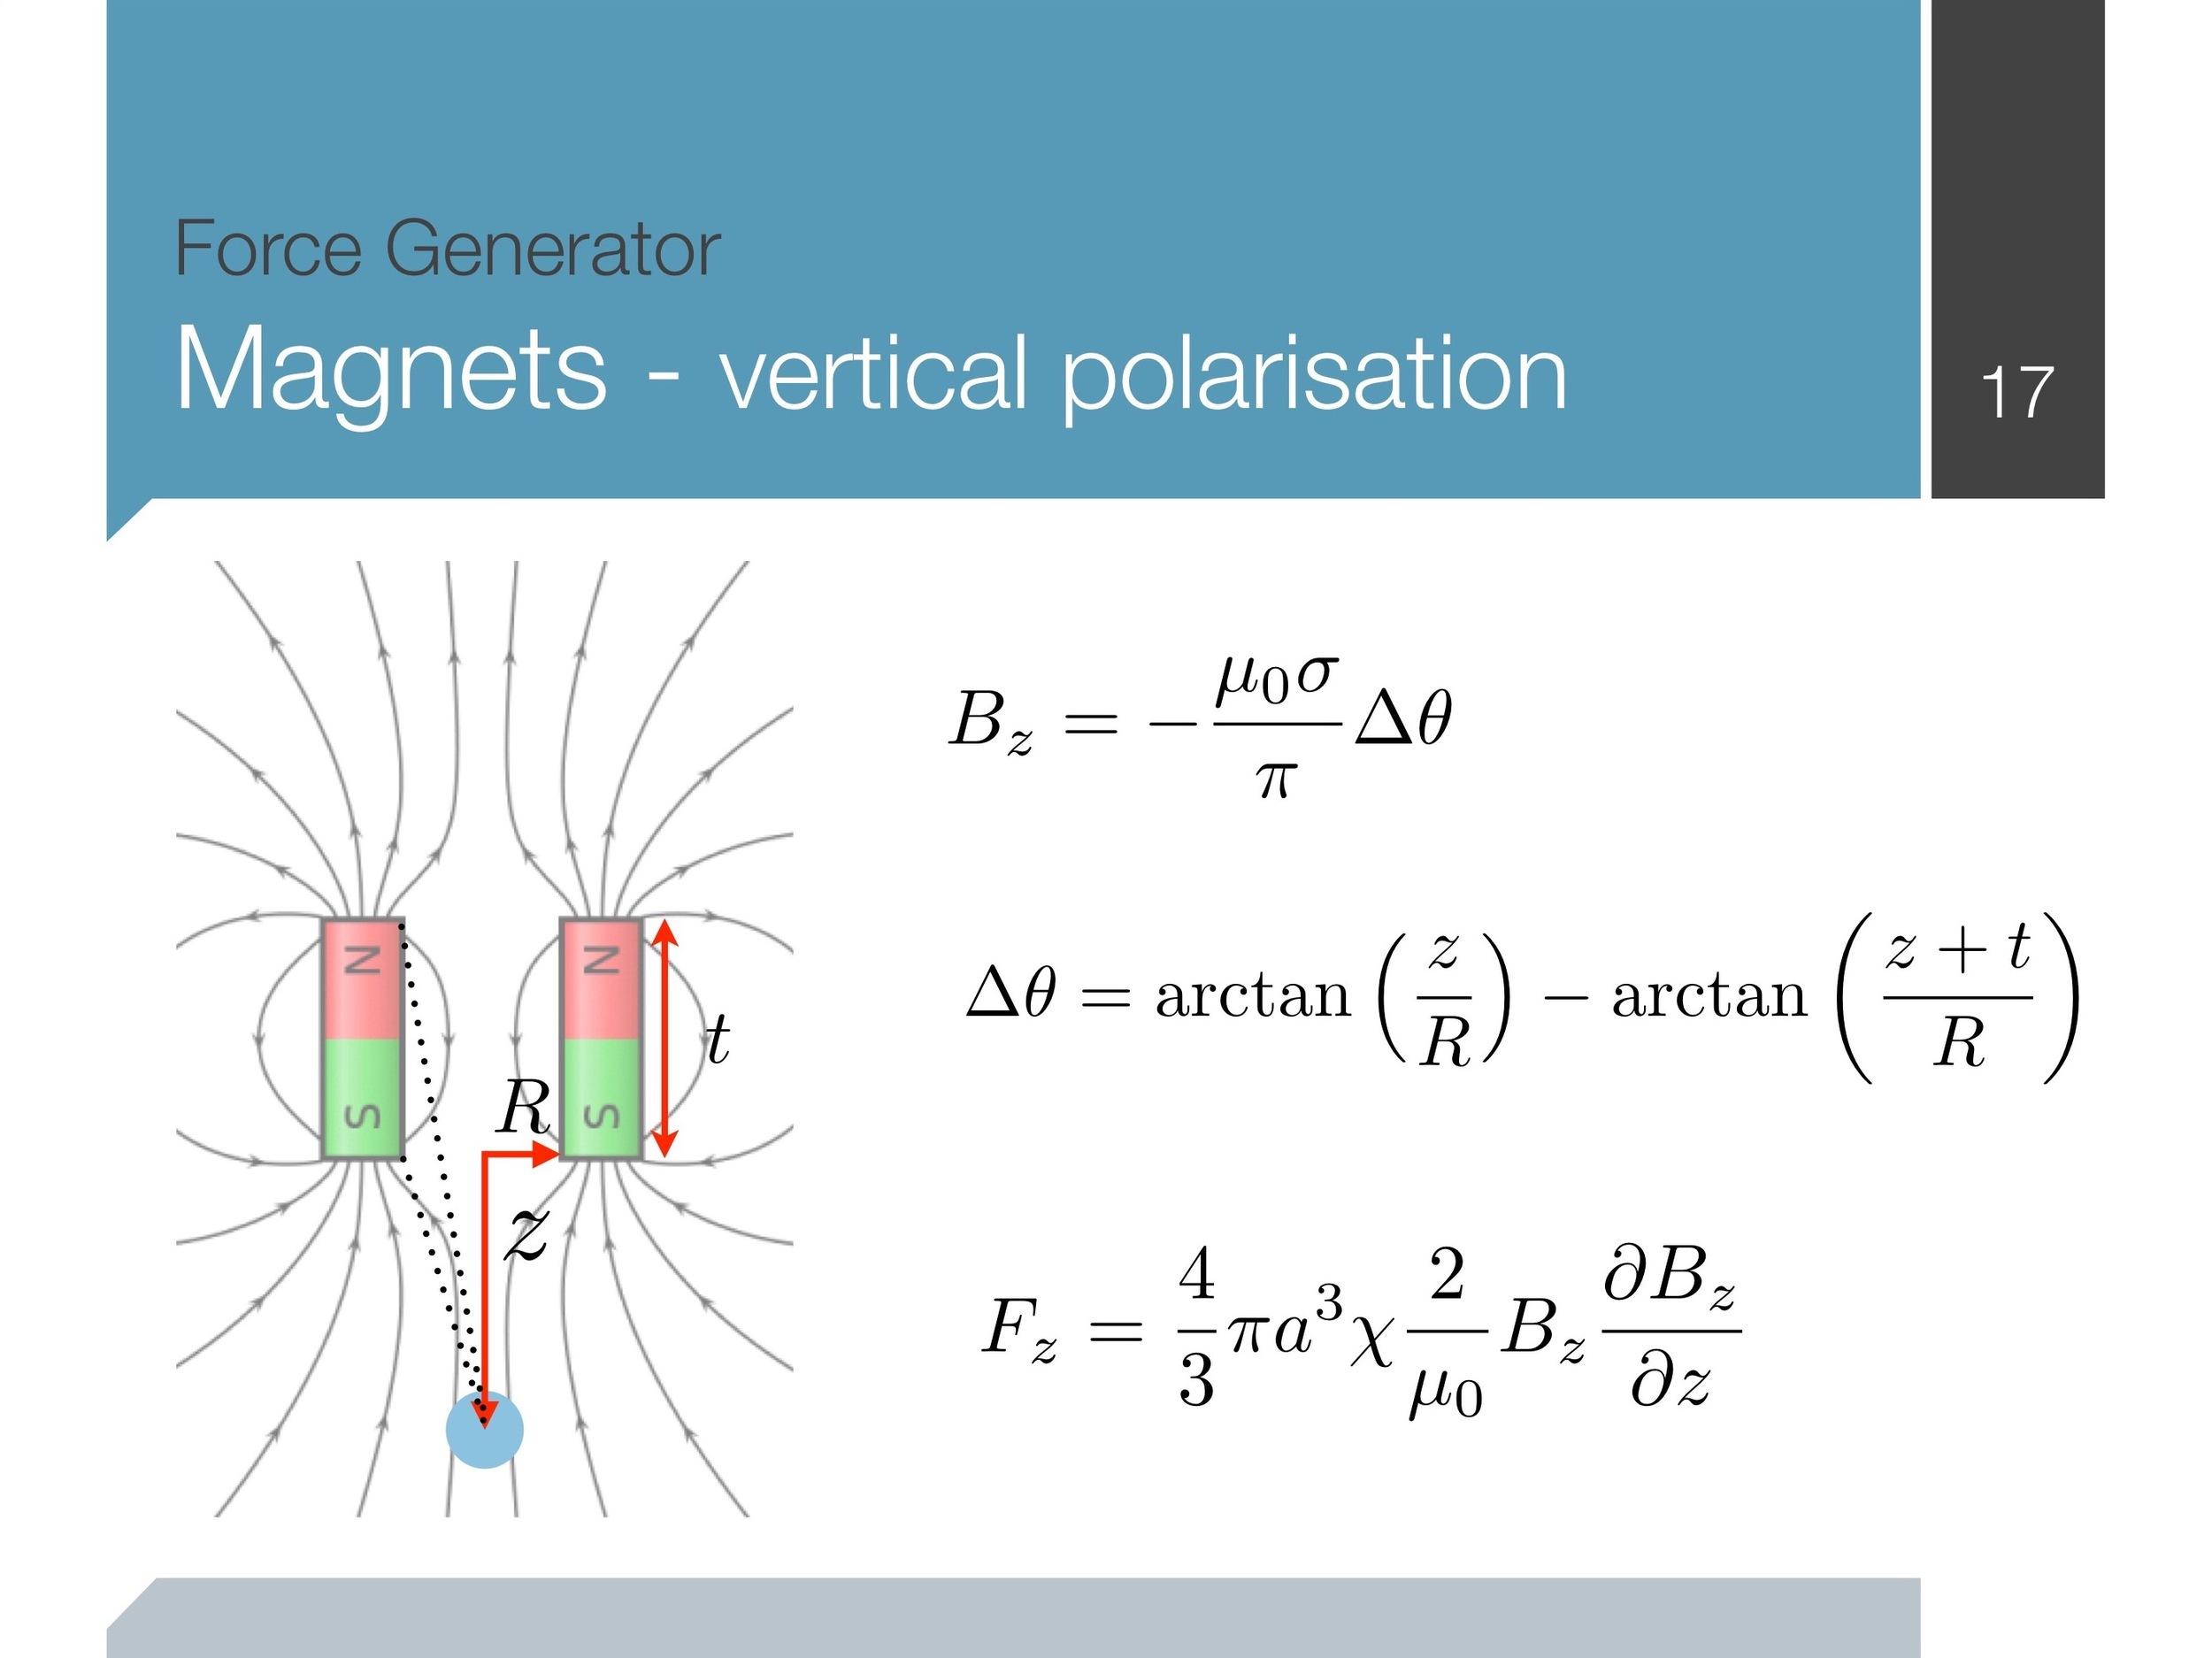 magnetic-tweezers_presentation 23 copy.jpeg